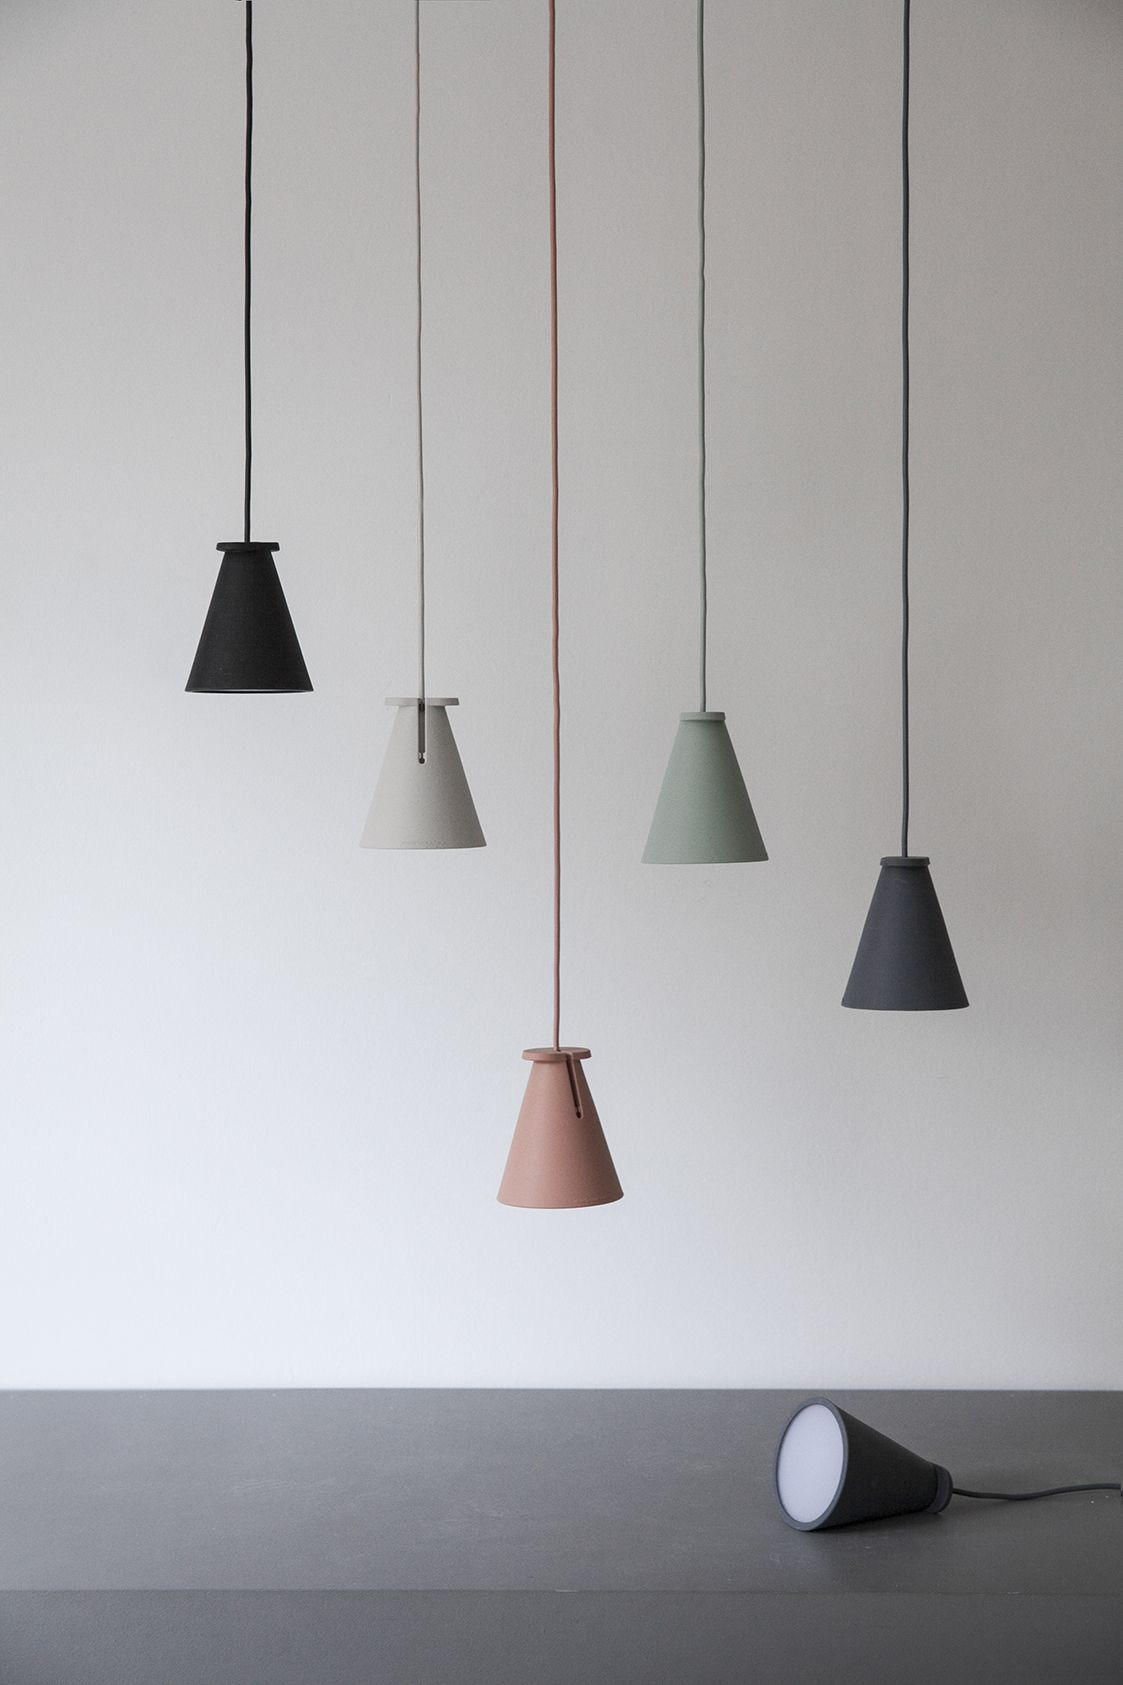 scandinavian lighting design. MENU, Bollard Lamp #menudesign #lamp #lighting #design #homedesign #sospensione. Scandinavian Lighting Design O